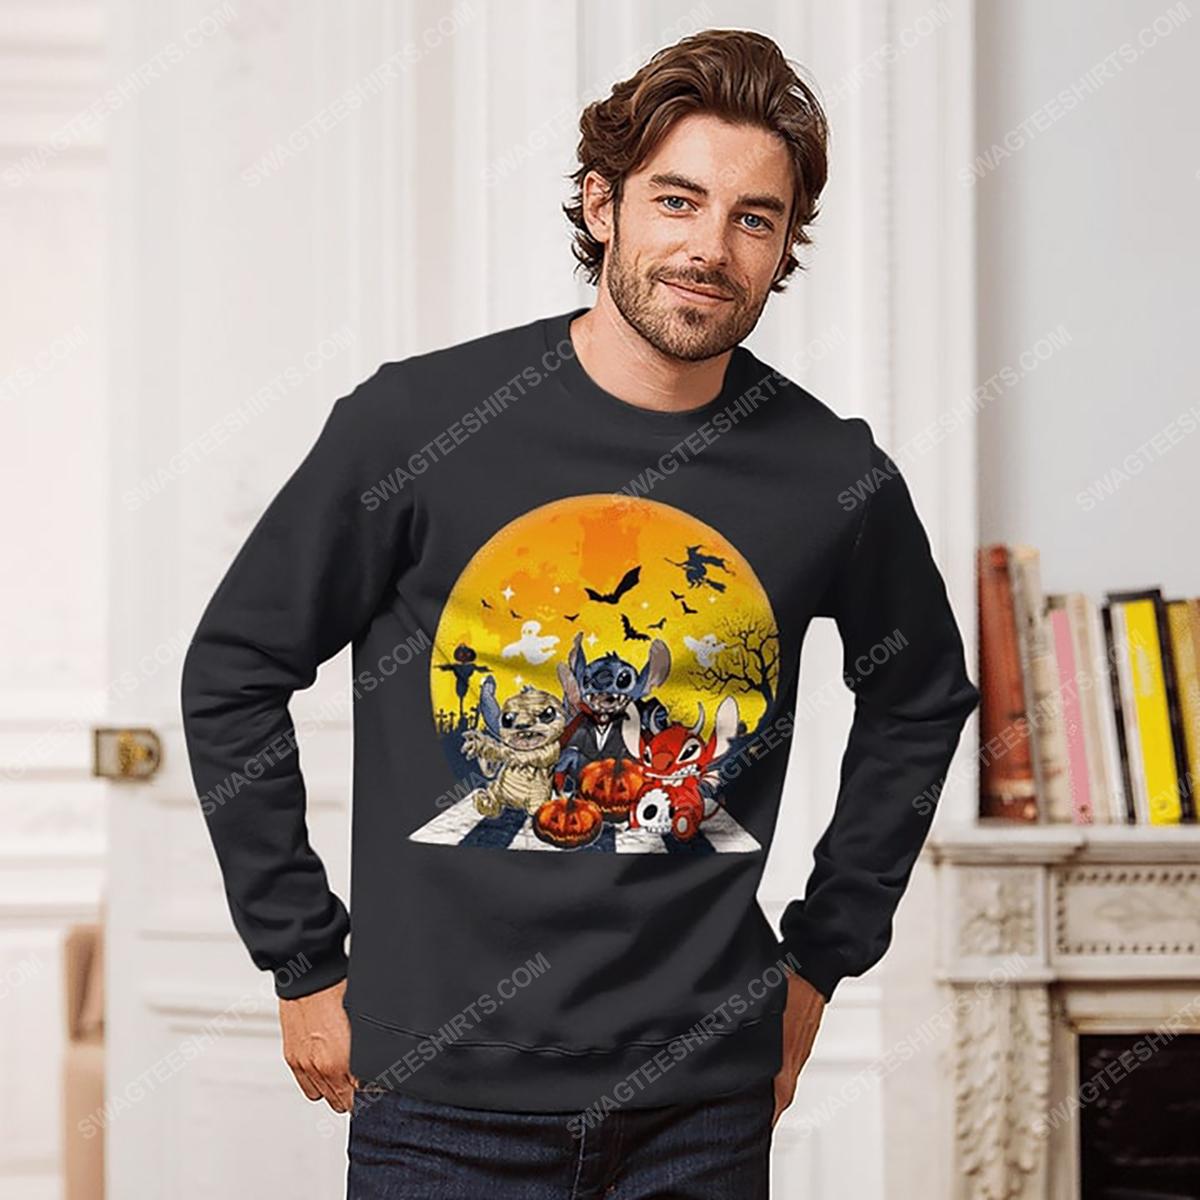 Halloween night stitch cosplay horror characters sweatshirt 1(1)